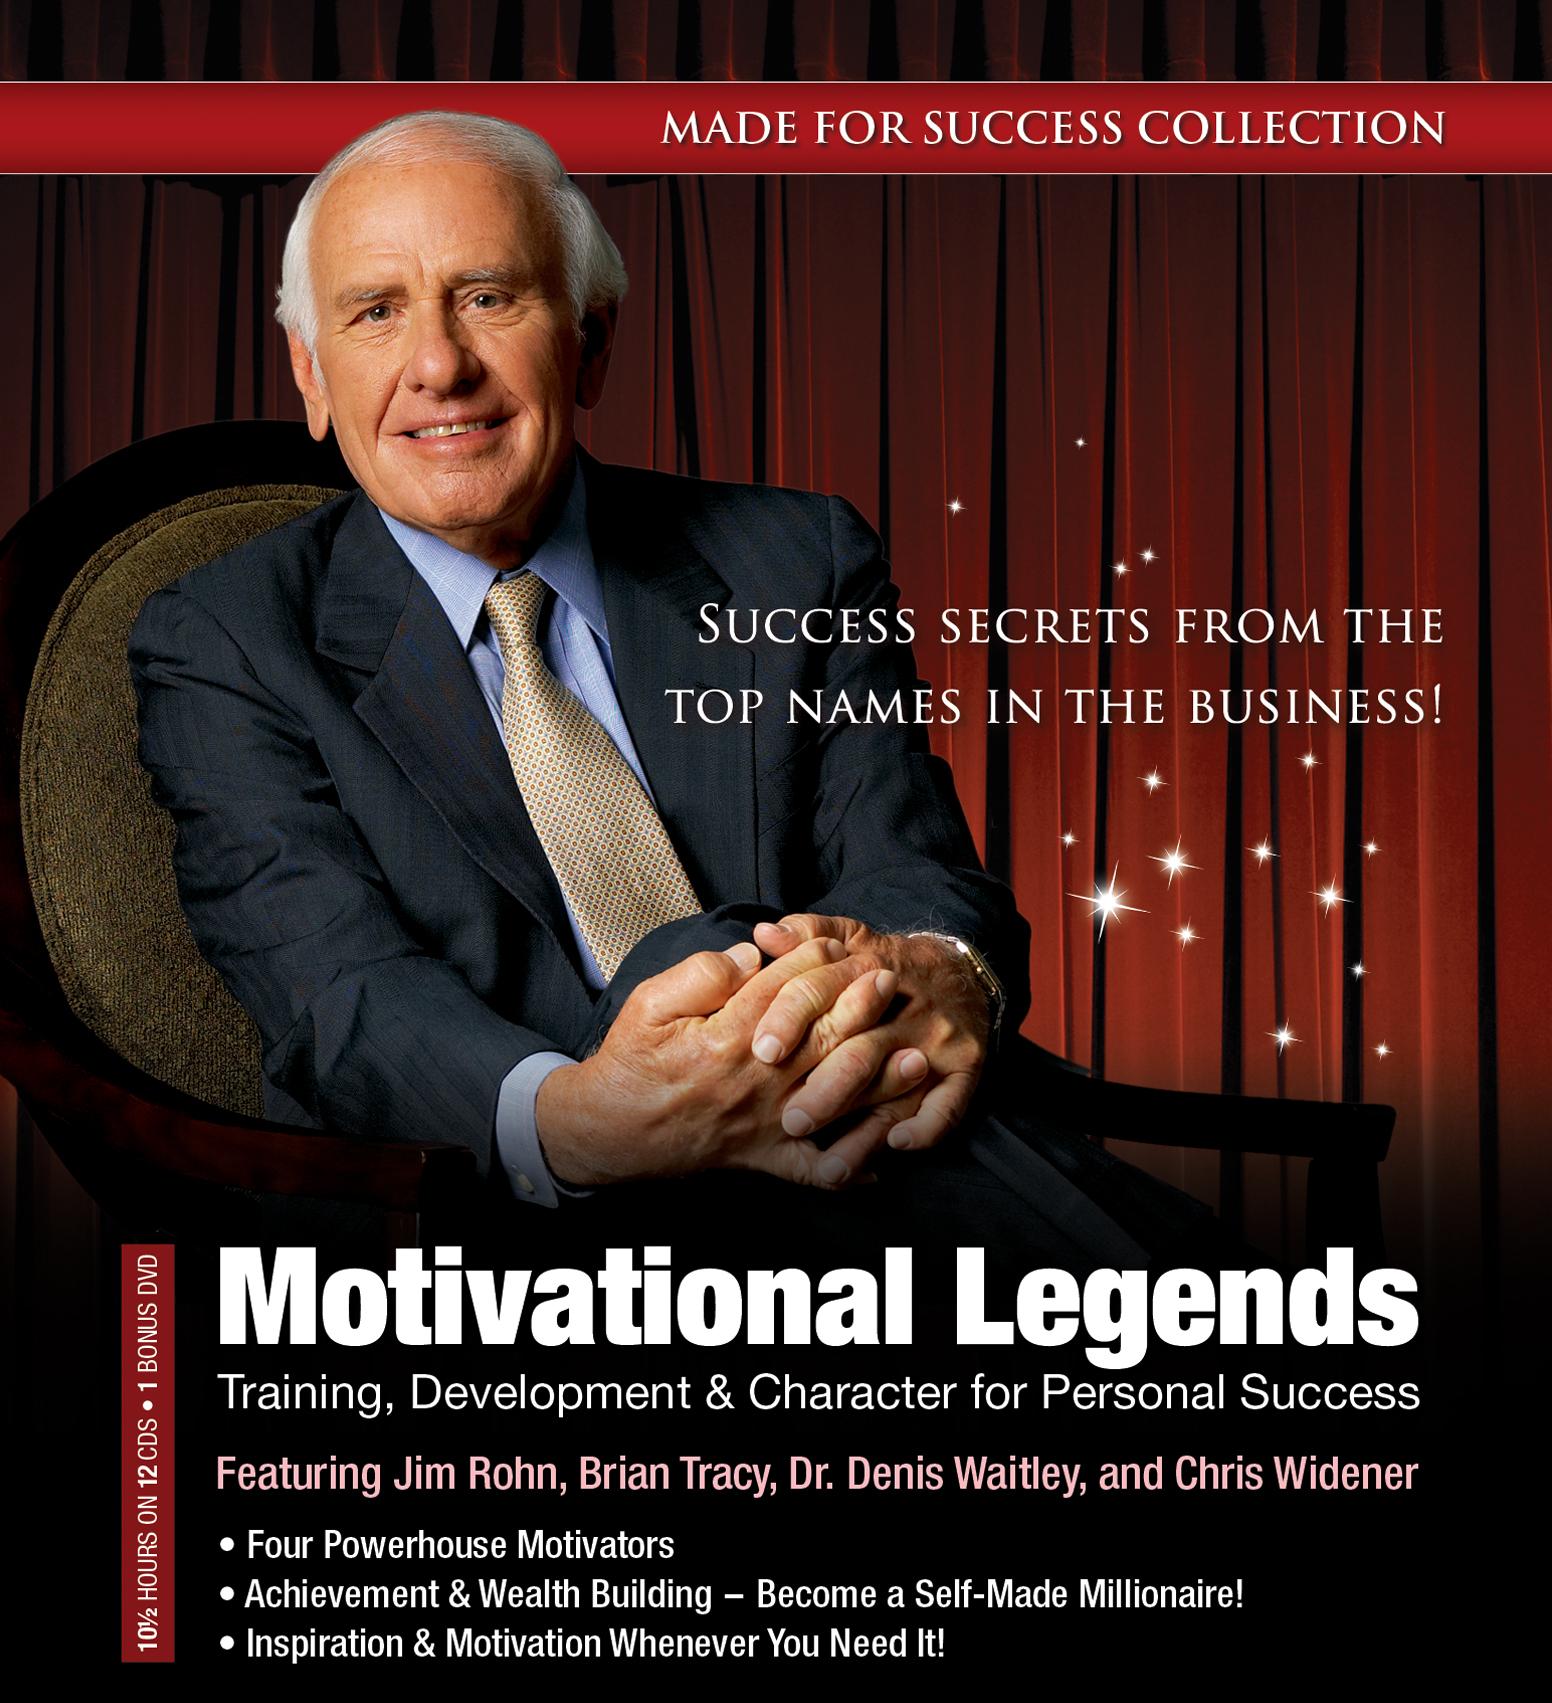 Motivational Legends